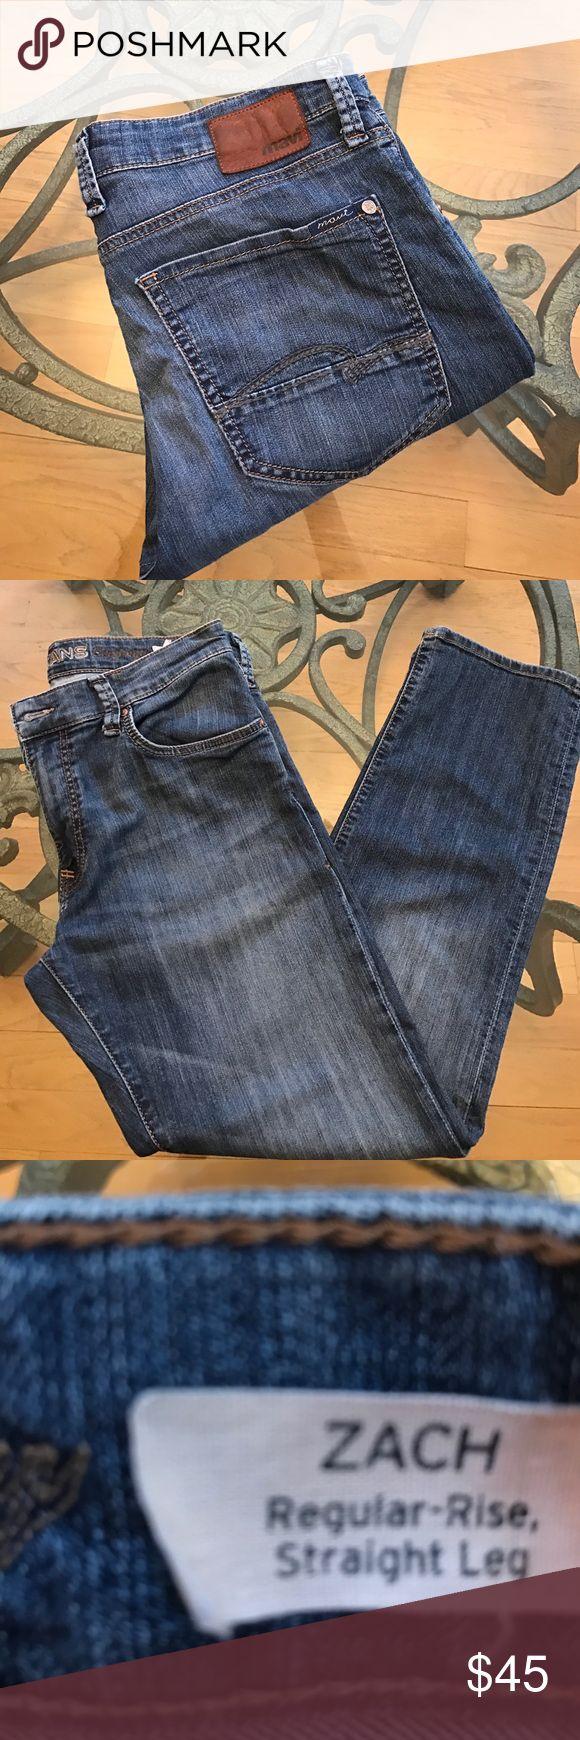 Mavi Men's Zach Jeans 👖 Great condition ! Mavi Jeans